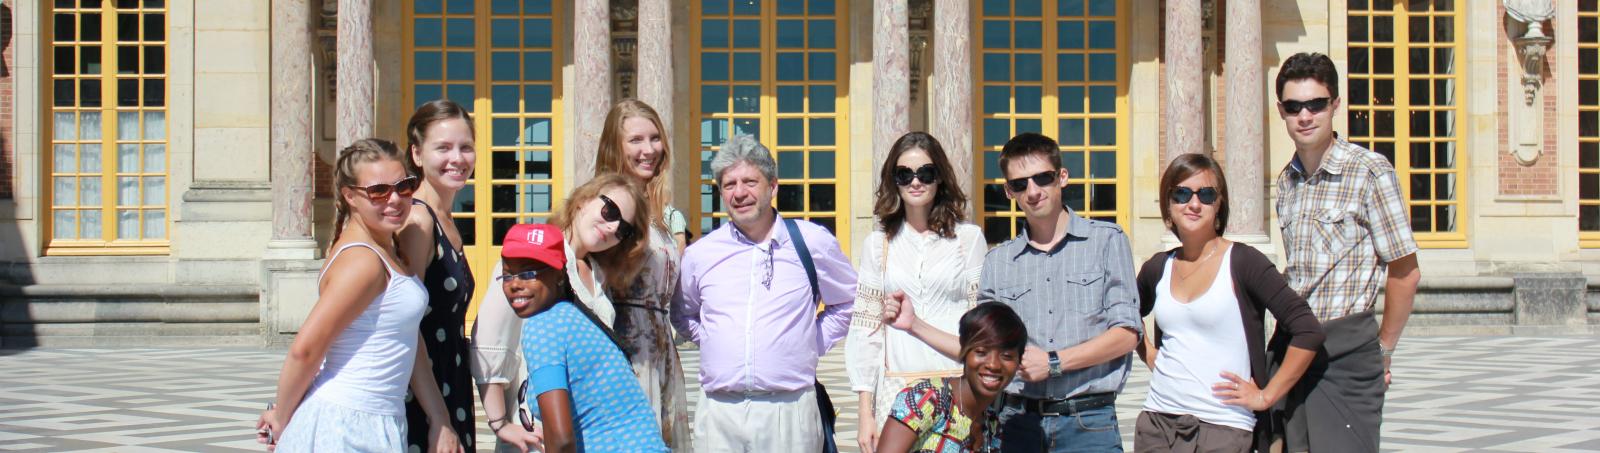 Paris Discovery Tours France